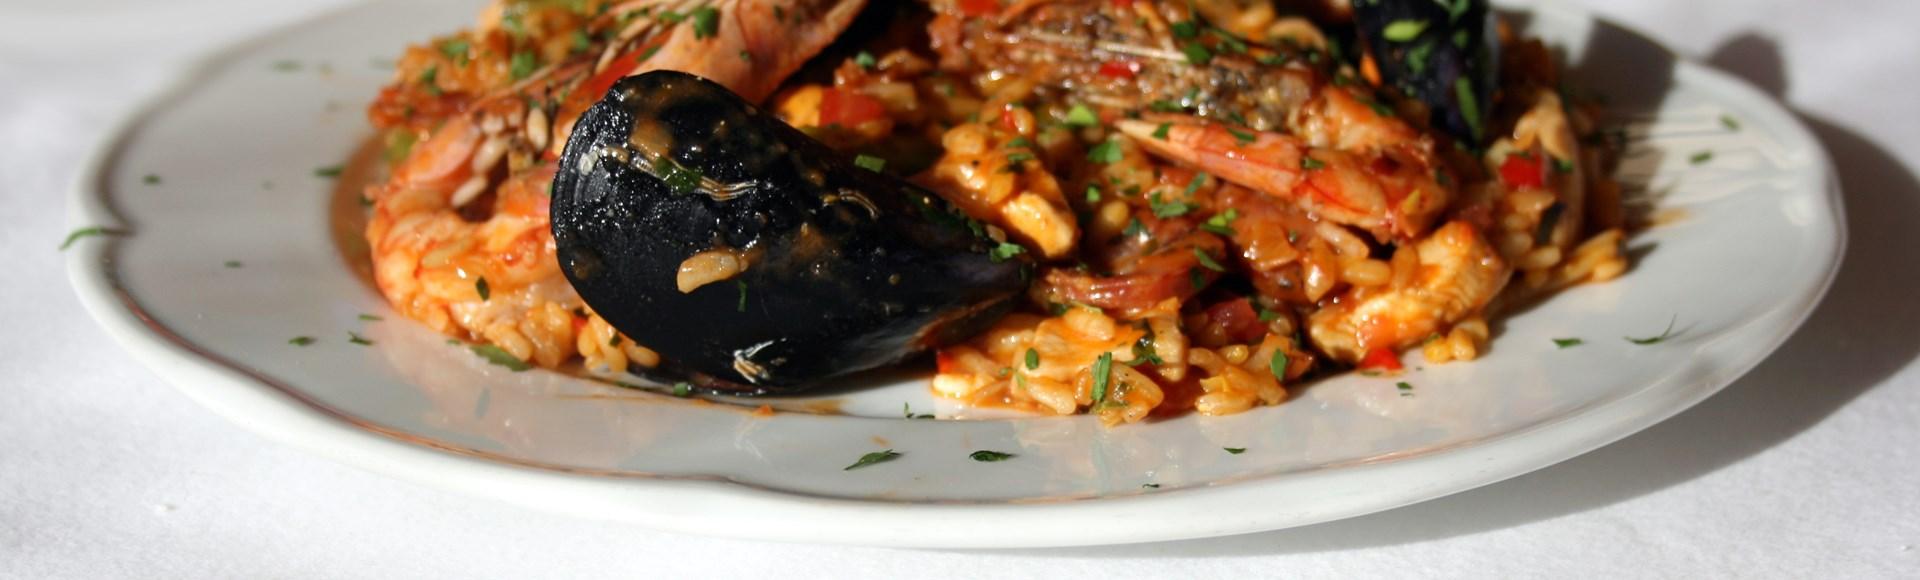 antonis-stavros-chania-crete-greece-14 - Chef Antonis & Stavros - Chania, Kreta, Hellas - Alargo | Håndplukkede ferieboliger på Kreta, Korfu og Paros